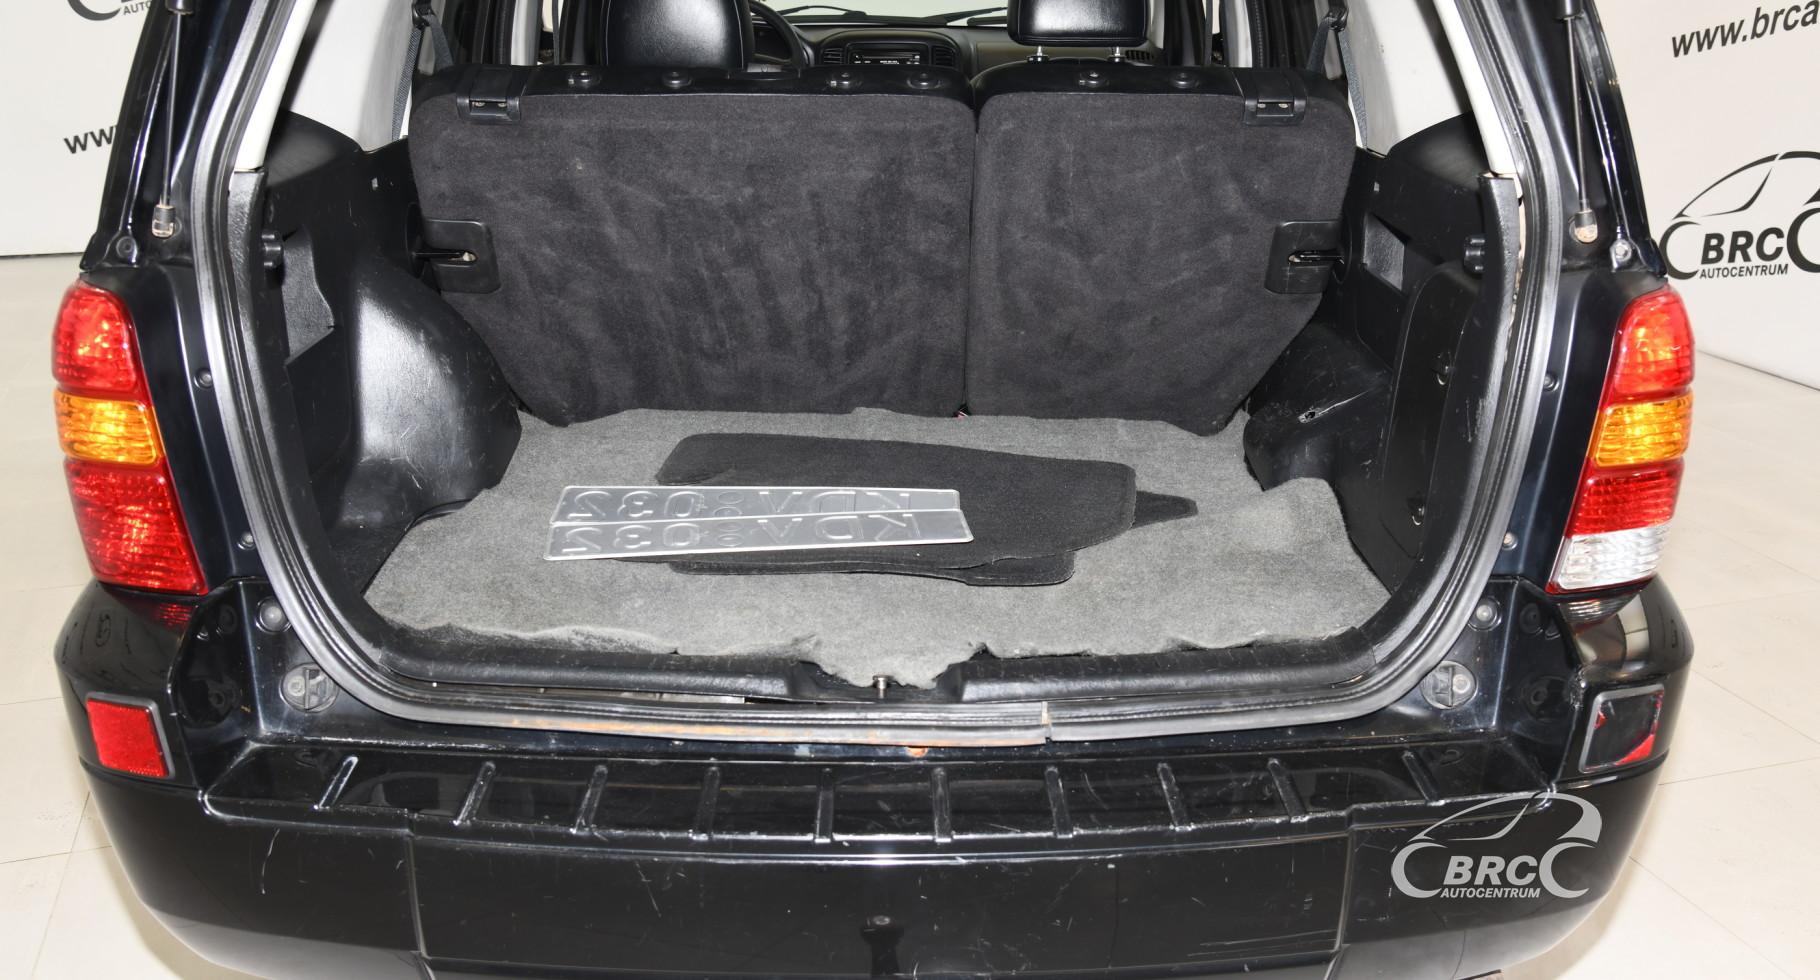 Ford Maverick 3.0 V6 24V XLT 4x4 Automatas